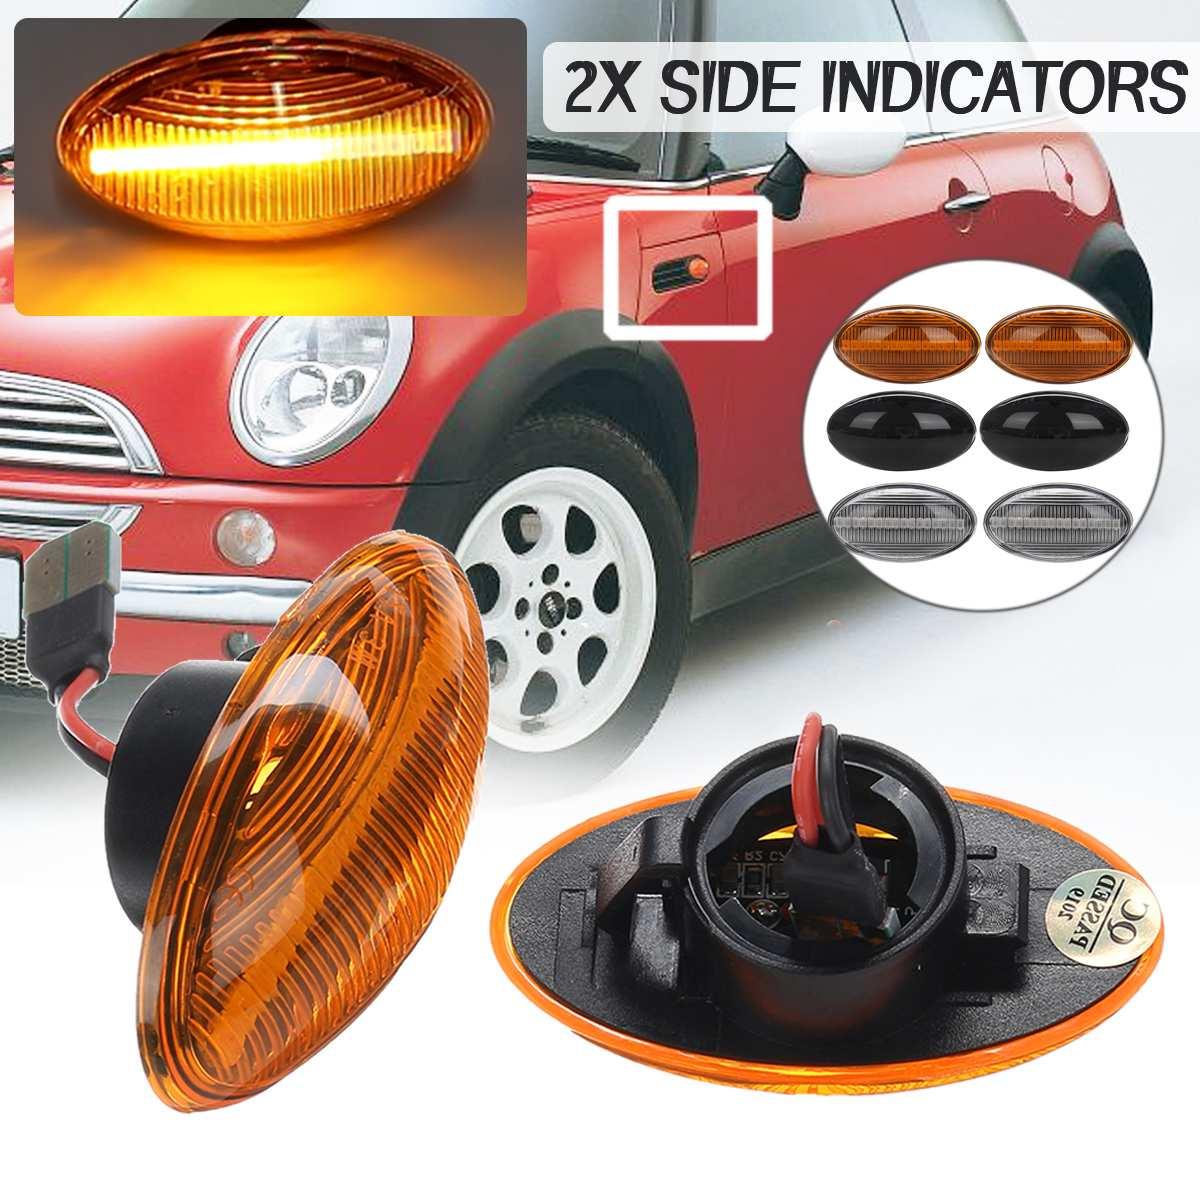 2 uds. Luz LED de posición lateral dinámica con repetidor lateral que fluye, lámpara de Panel libre de errores para BMW para MINI Cooper R50 R52 R53 02-08